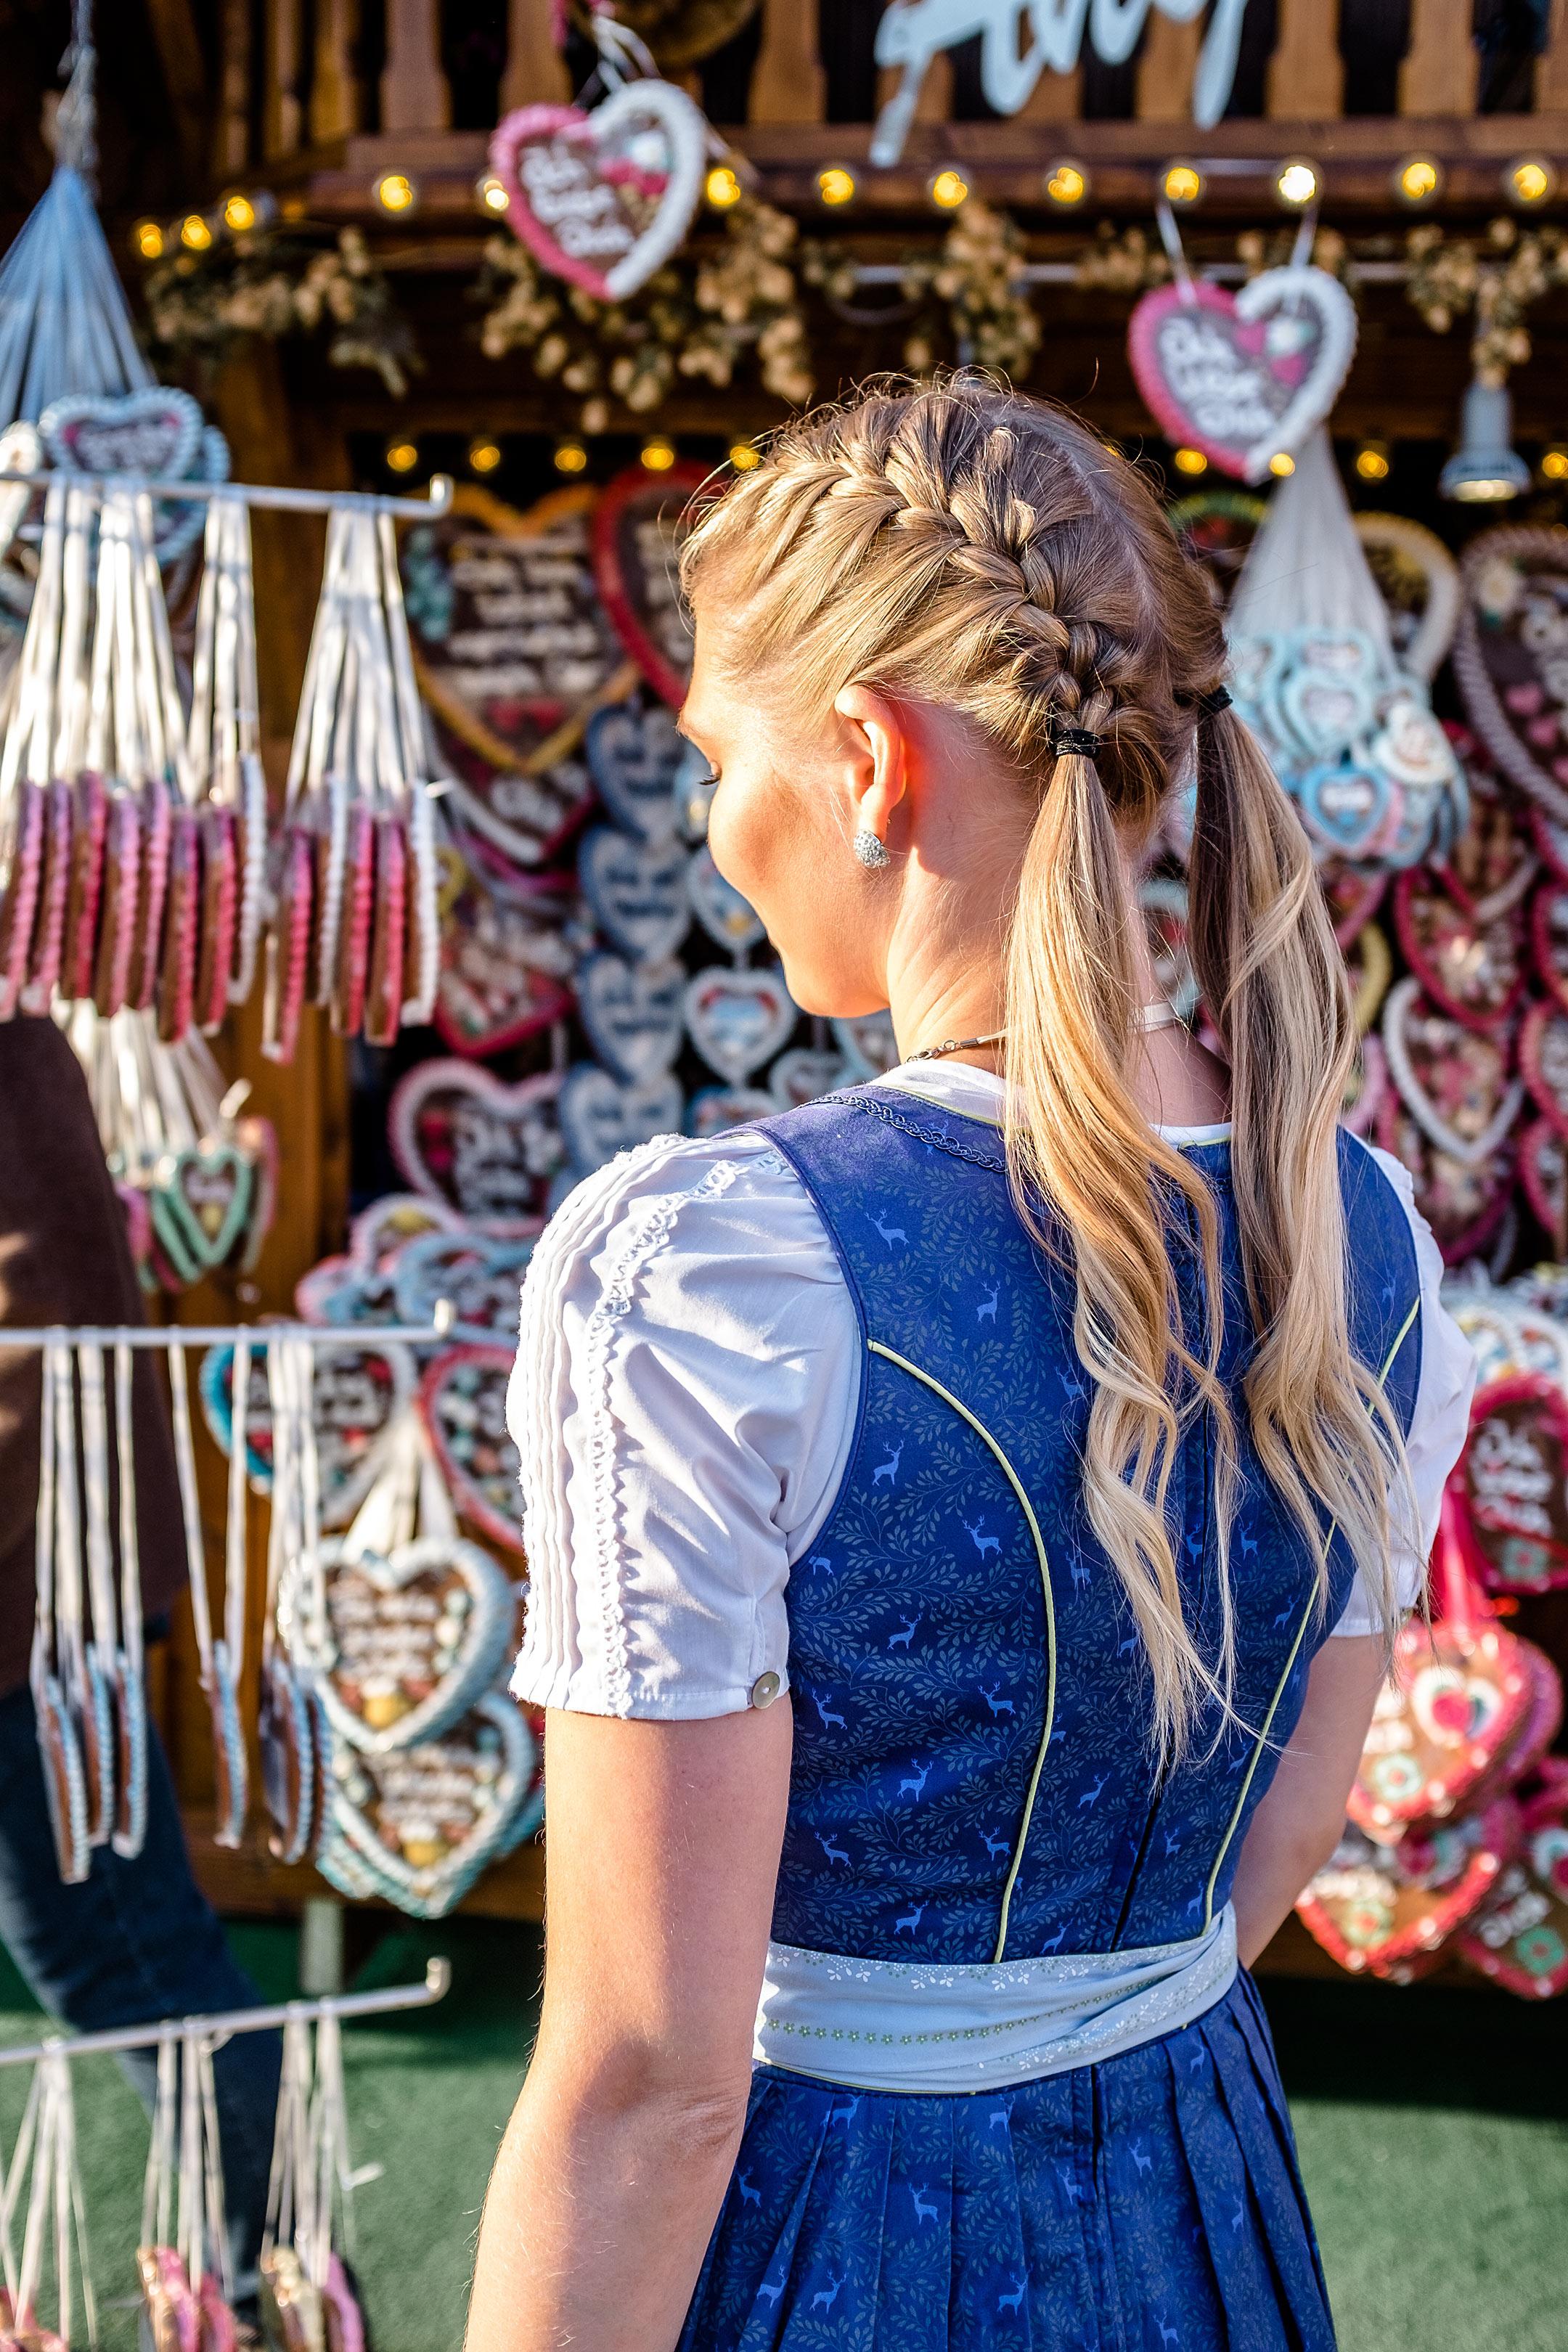 Oktoberfest Frisur Flechtfrisur Zöpfe Wiesn Fashion Blog Sunnyinga